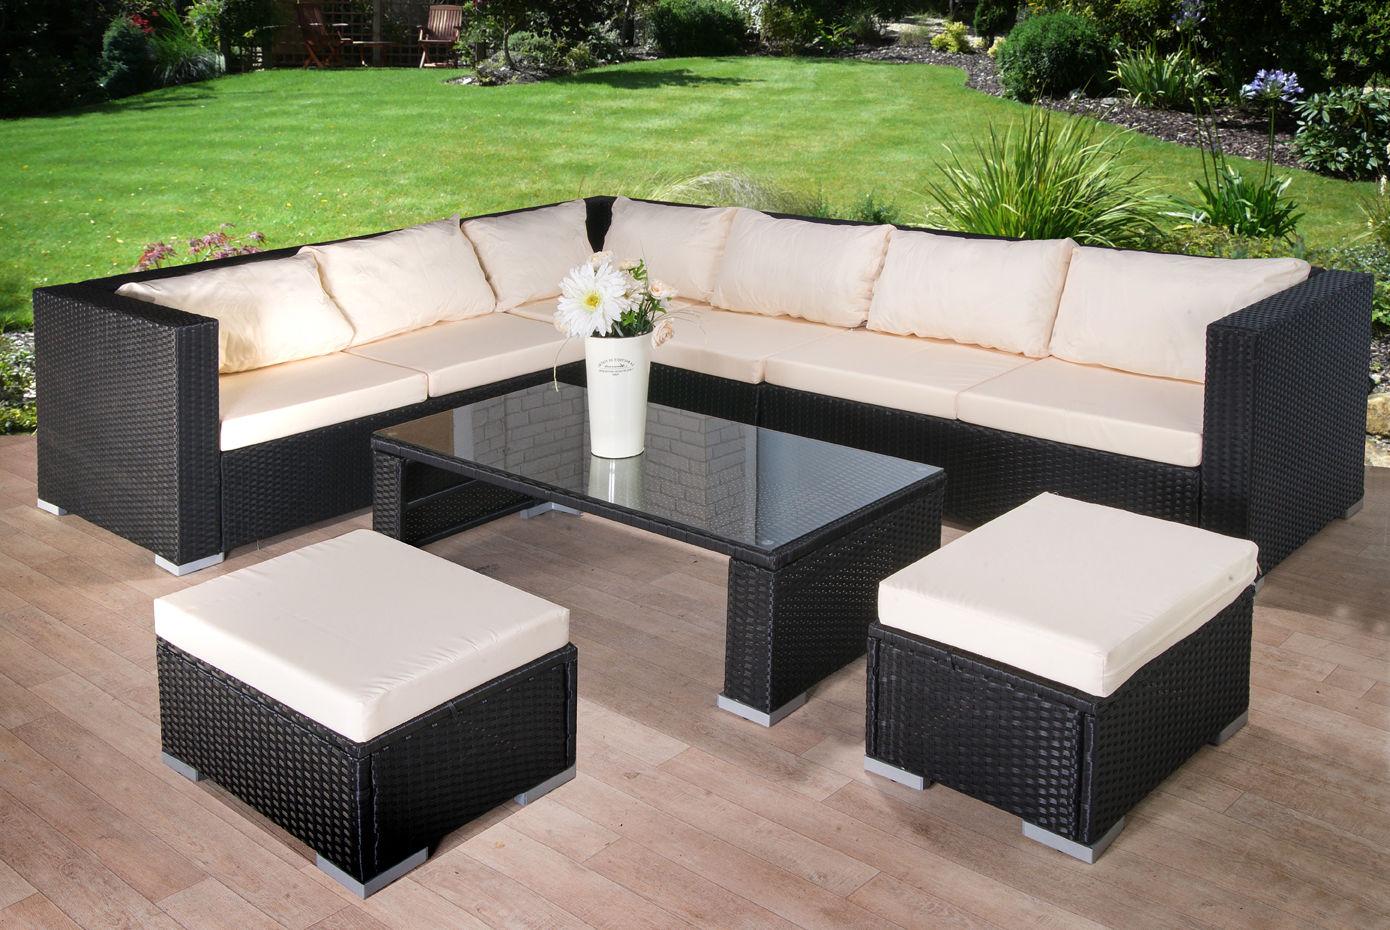 Modern rattan garden furniture sofa set lounger eight seater outdoor patio furniture